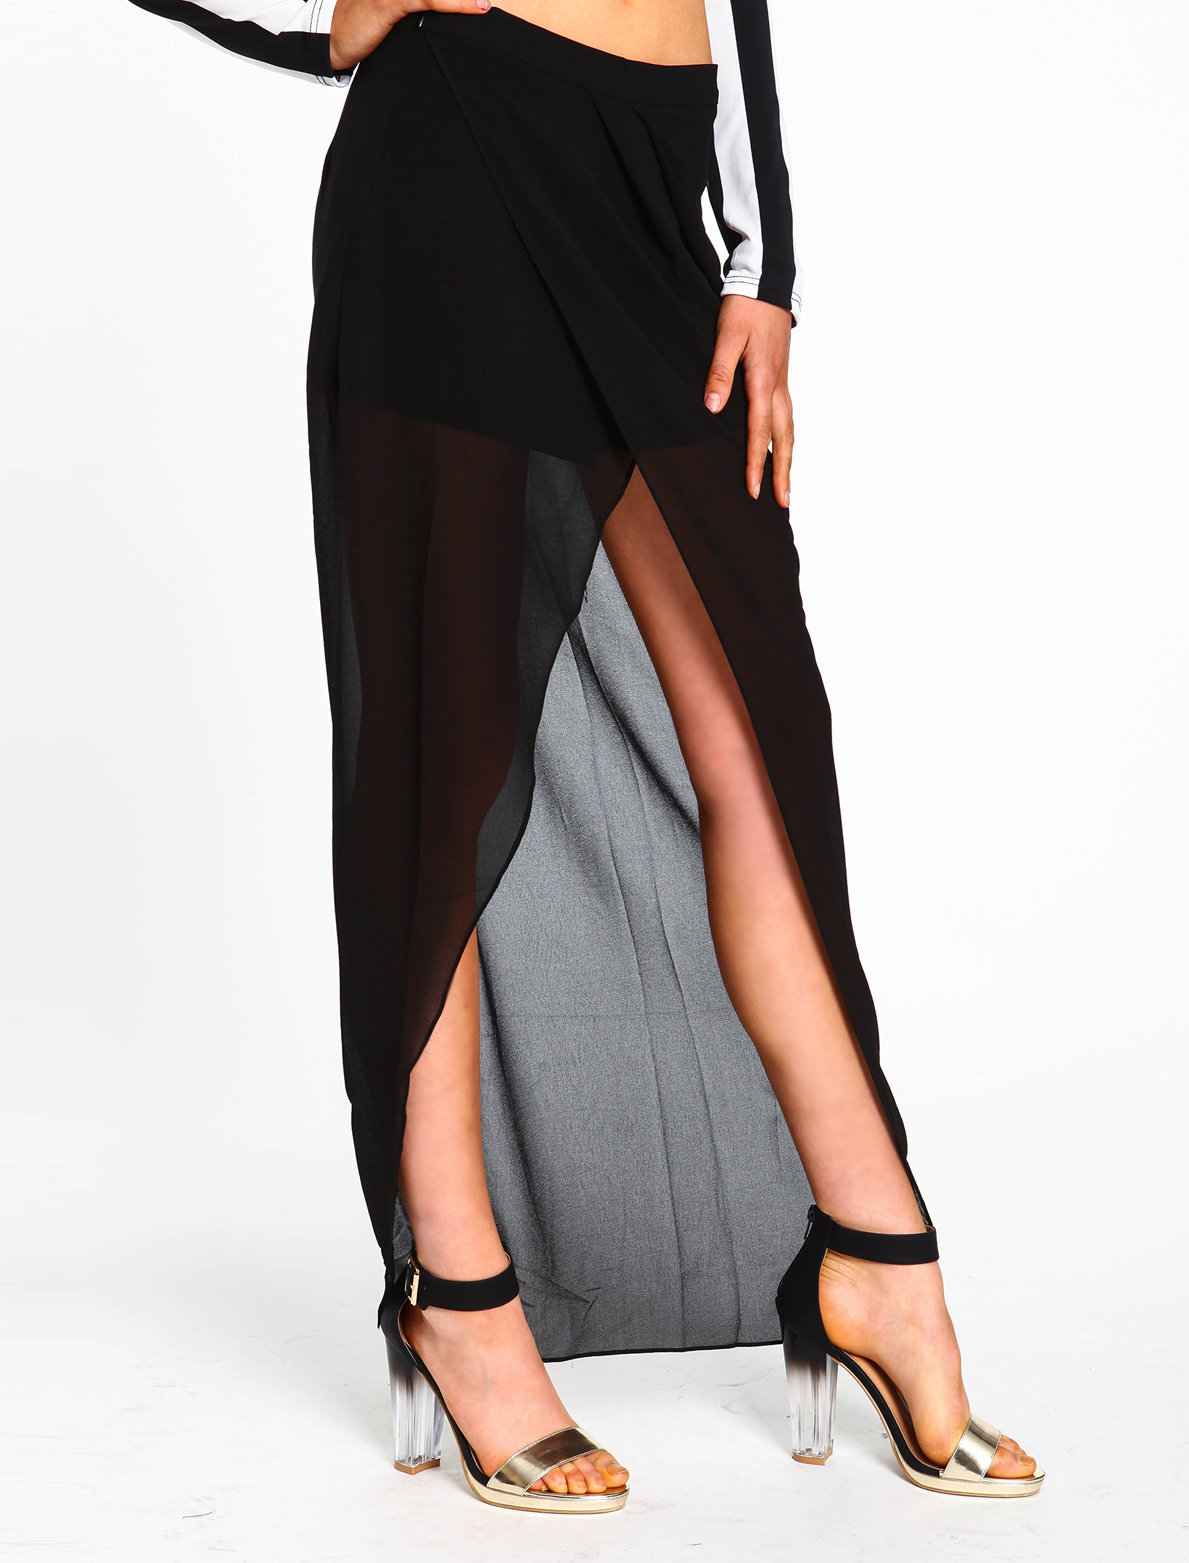 #Love Culture             #Skirt                    #Wrap #Chiffon #Skirt     Wrap Chiffon Skirt                                  http://www.seapai.com/product.aspx?PID=4146